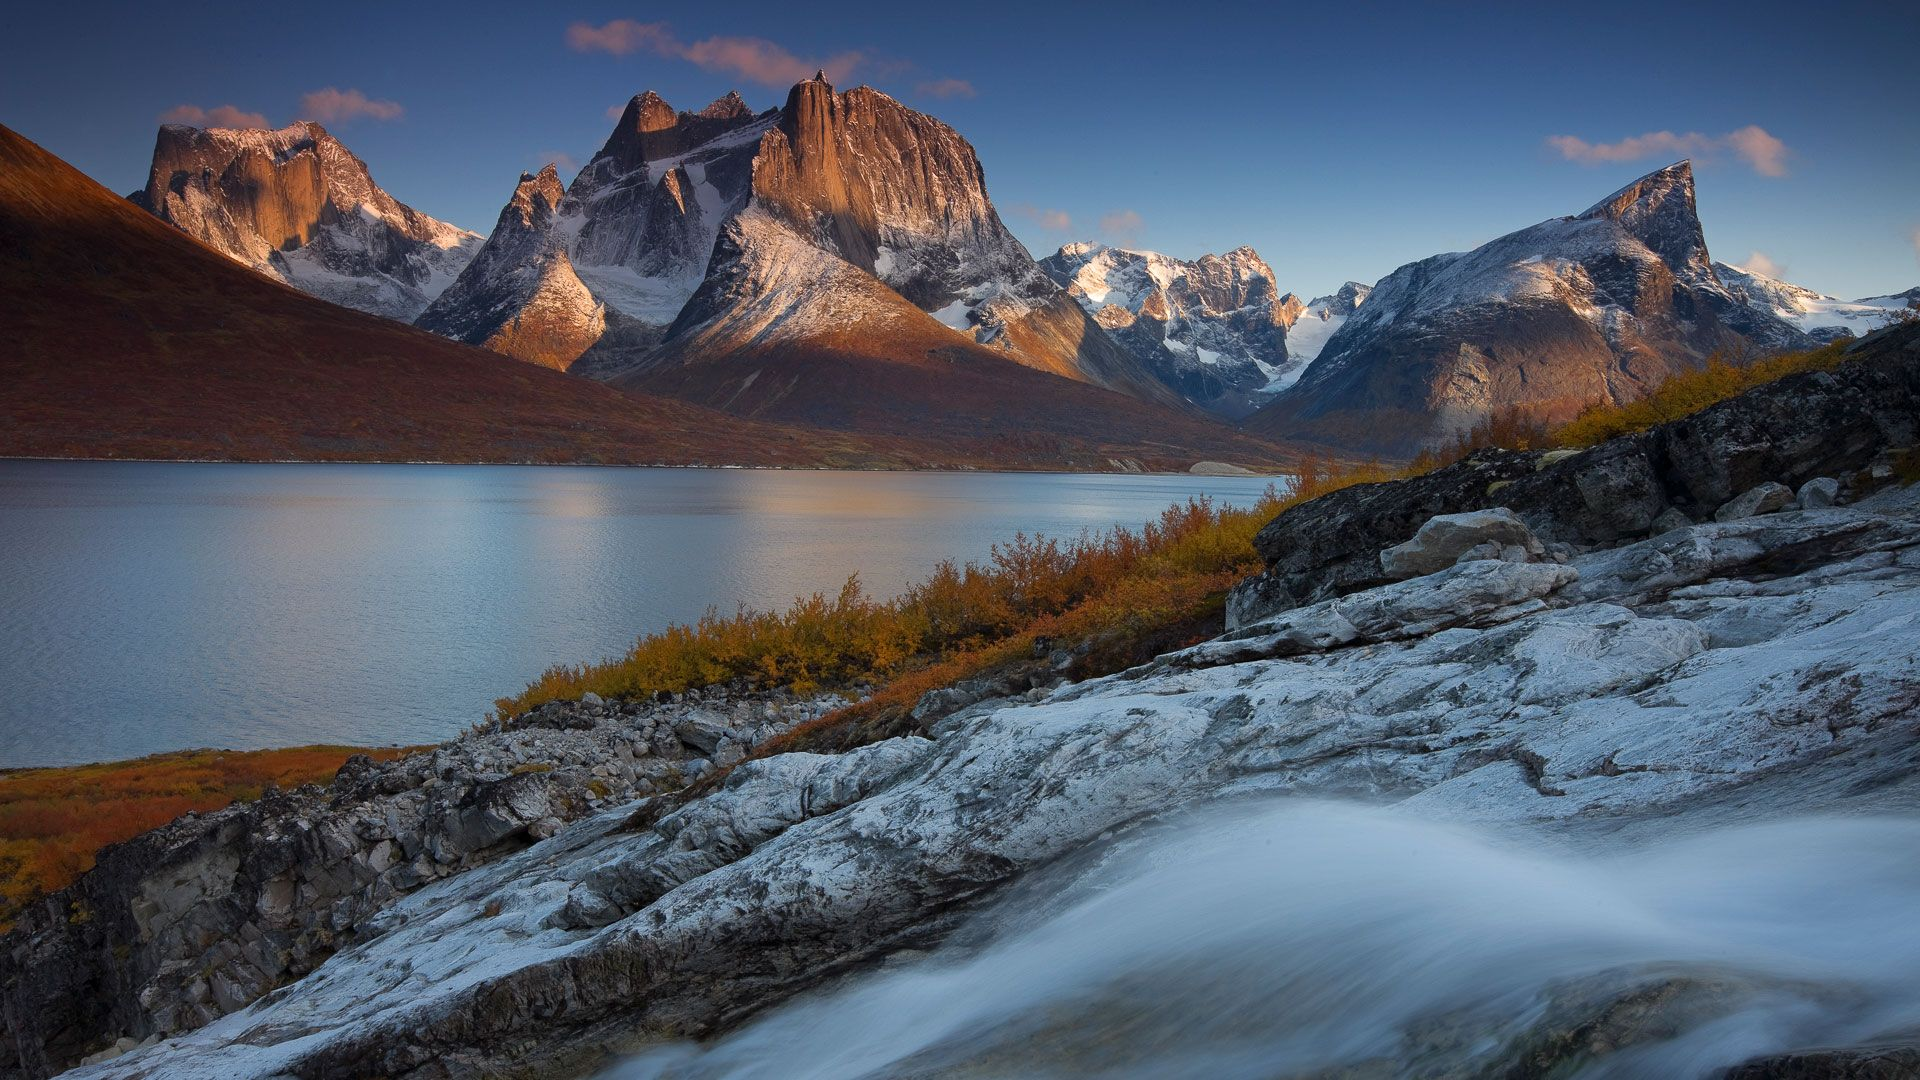 Windows Spotlight Oc 1920x1080 Greenland Travel Beautiful Landscape Photography Scenery